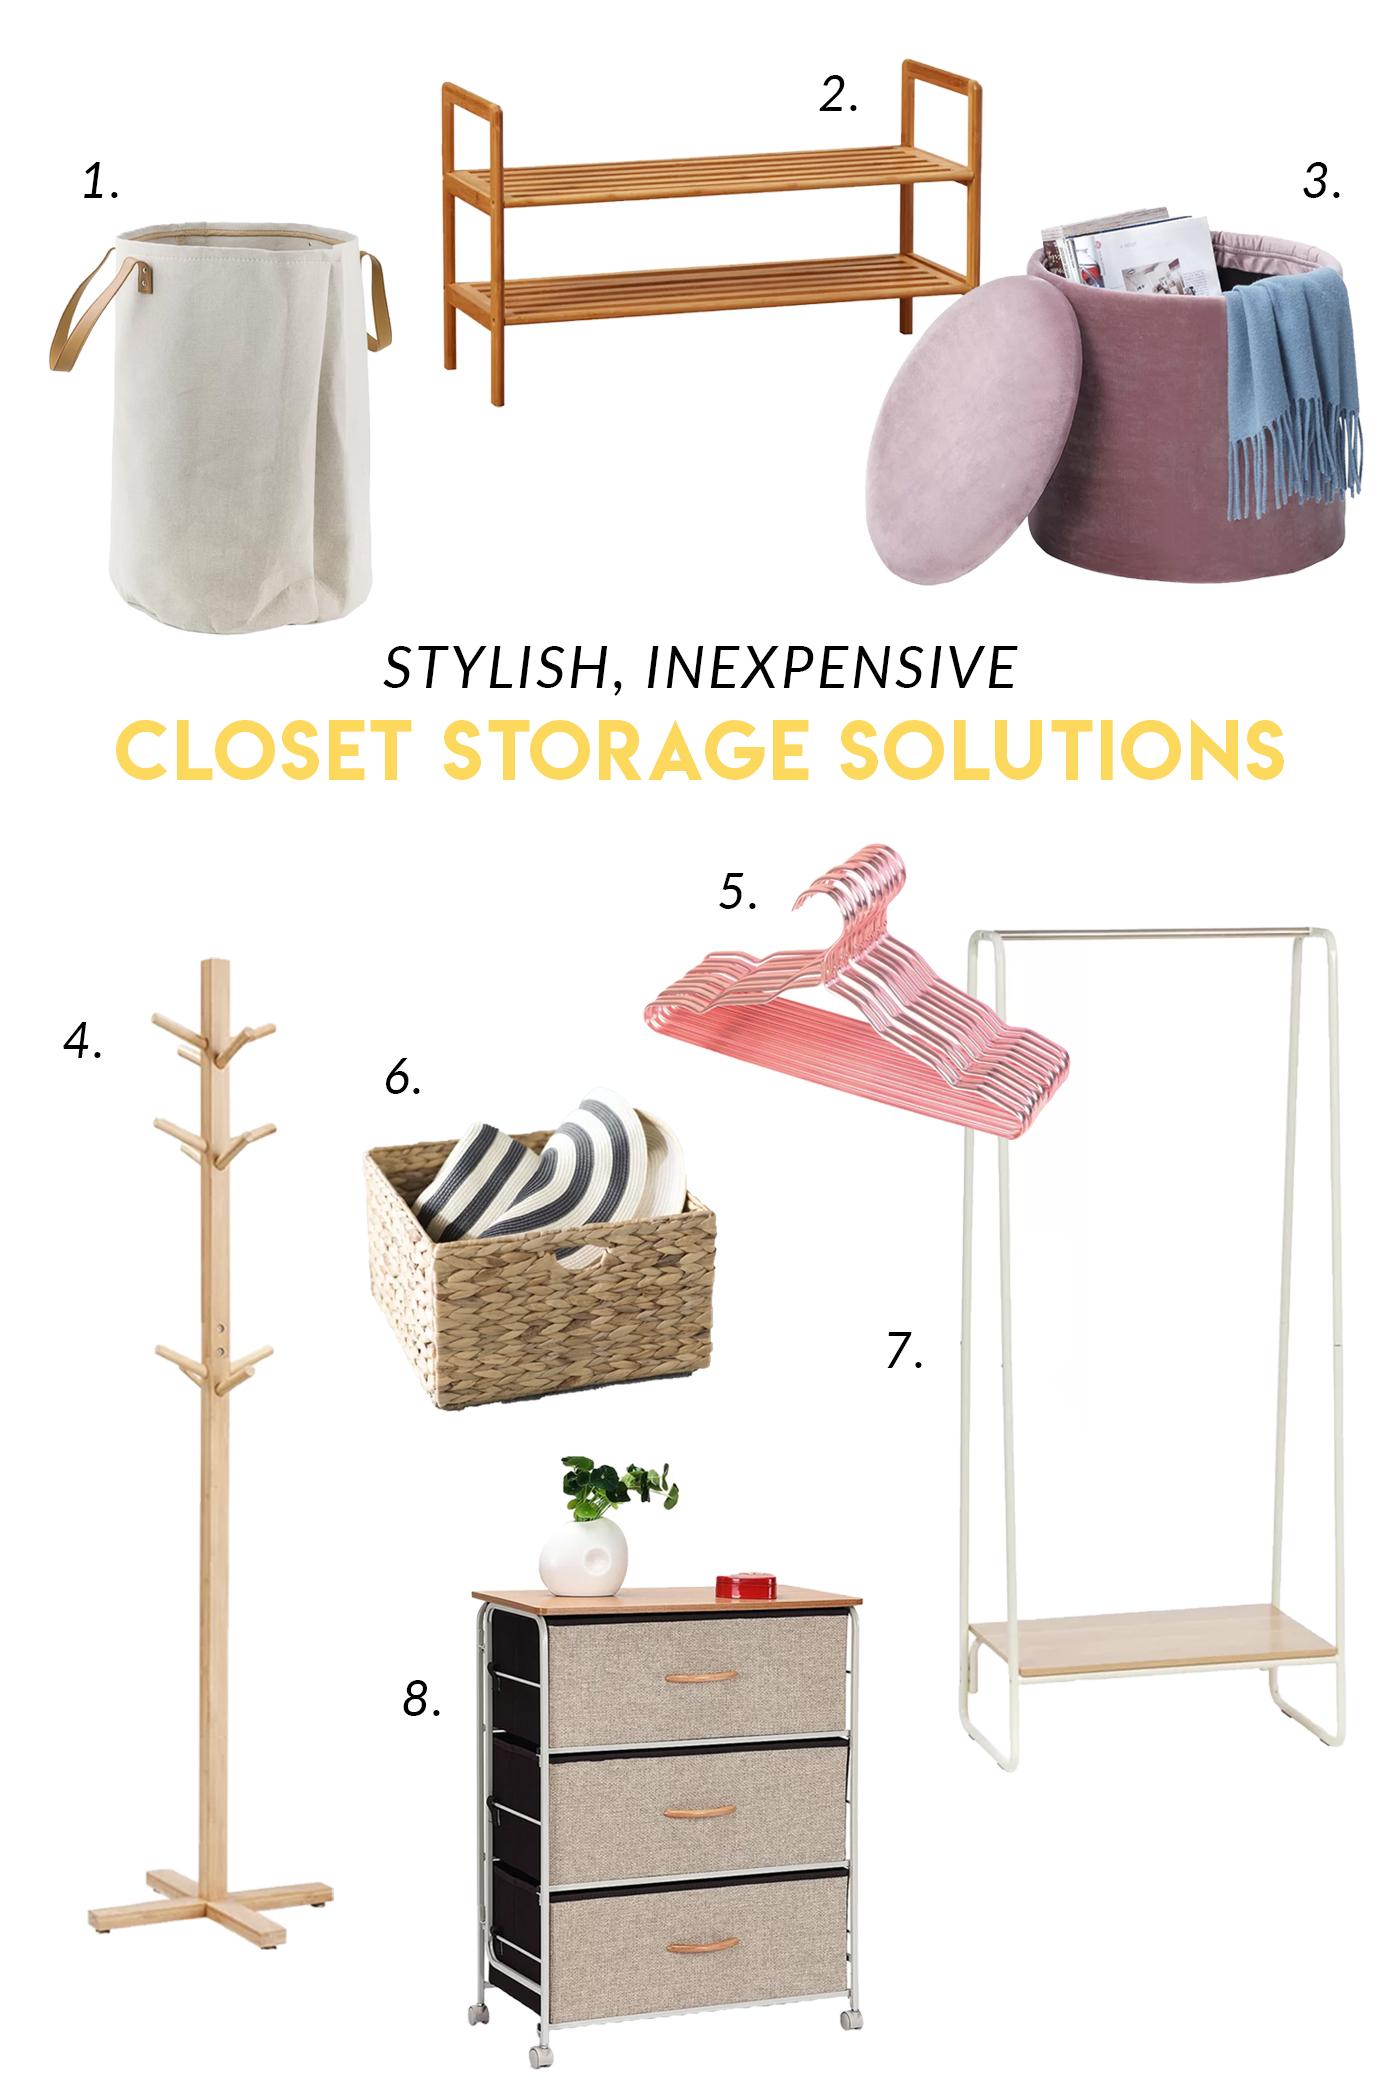 Stylish, Inexpensive Closet Storage Solutions / Shop these favorite inexpensive storage solutions from Wayfair for managing your messy closet! #shopping #closet #organization #homedecor #wishlist #wardrobestorage #minimalist